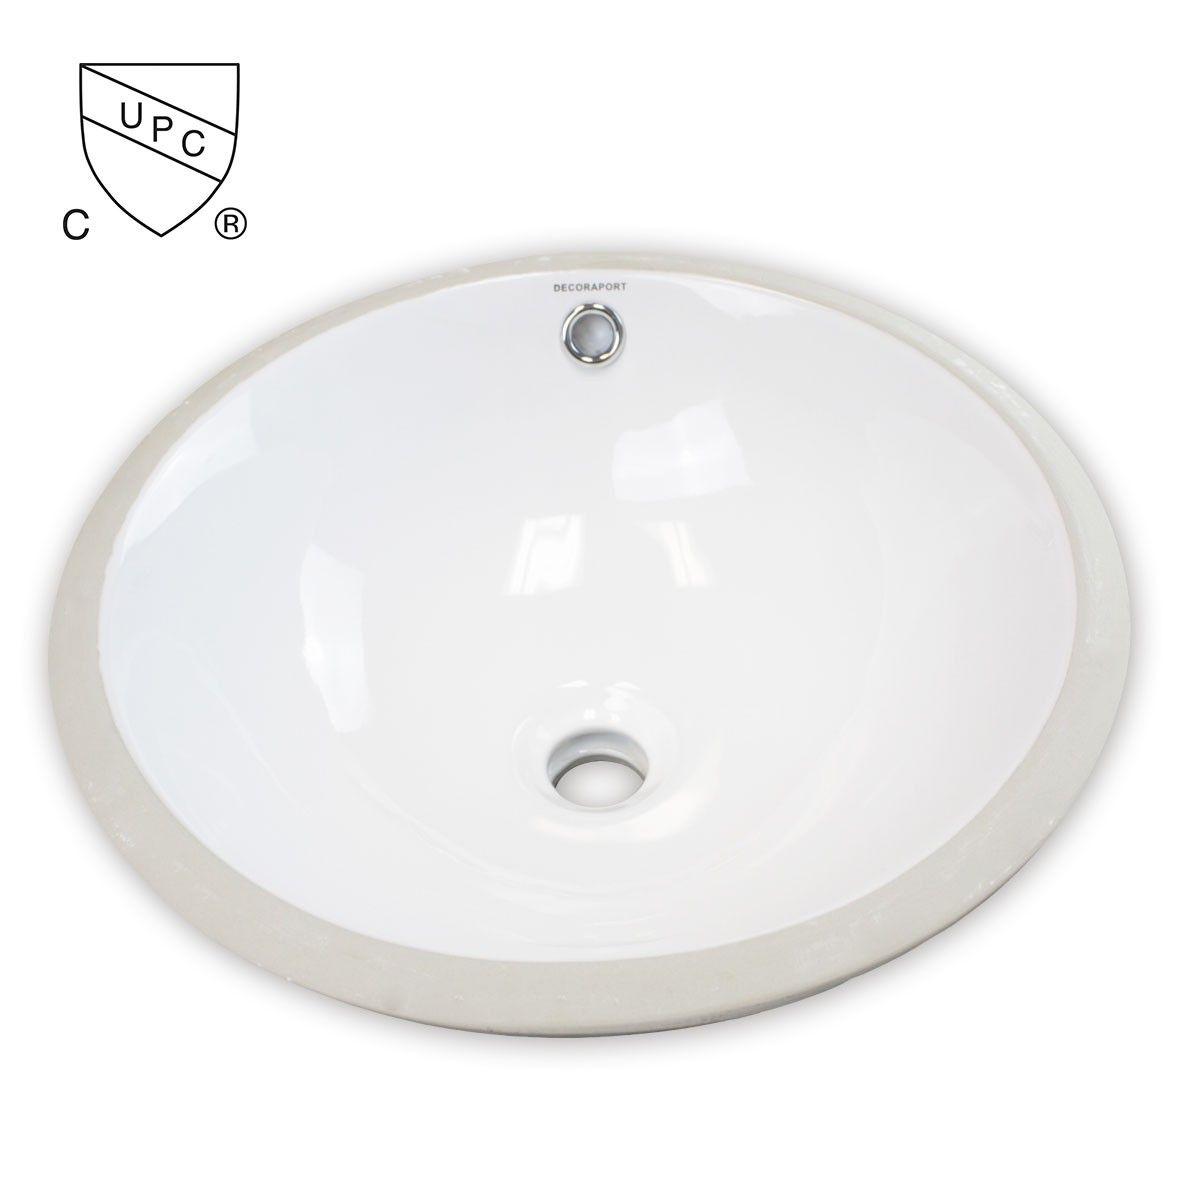 Decoraport White Round Ceramic Under Mount Basin (MY-3712)